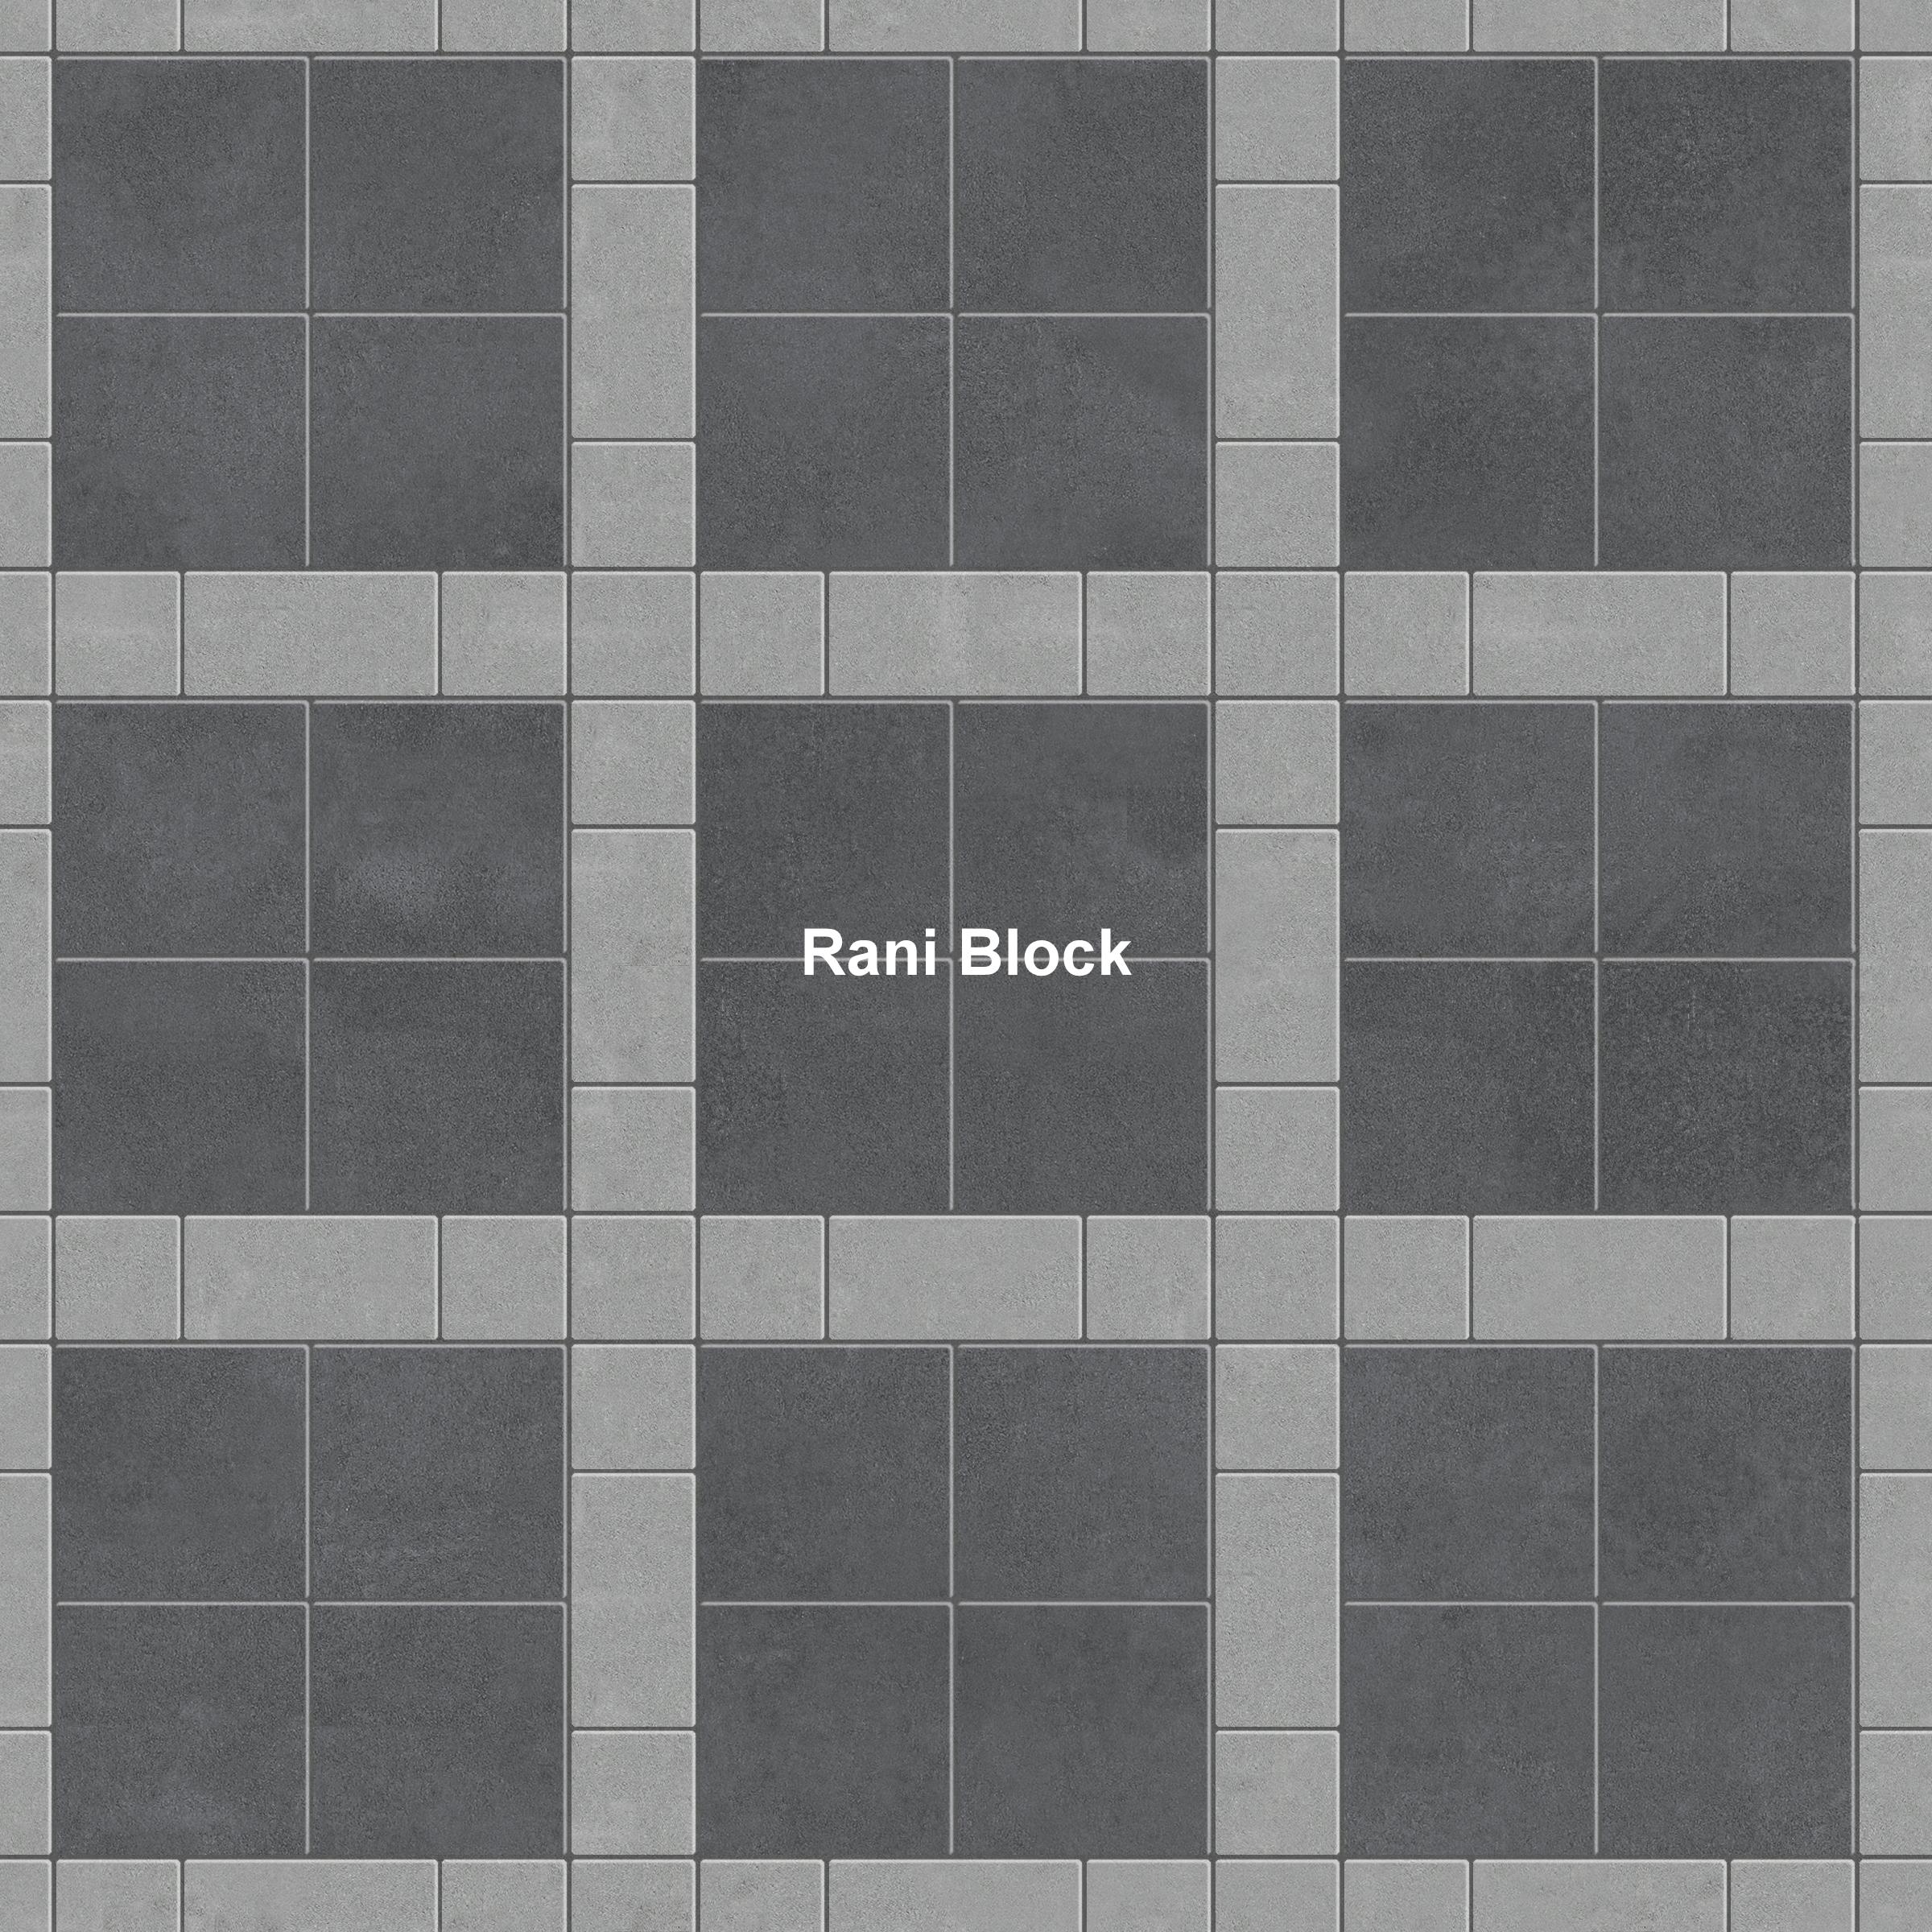 Kombinasi Paving Block Bata, Ubin dan Kubus Rani Block